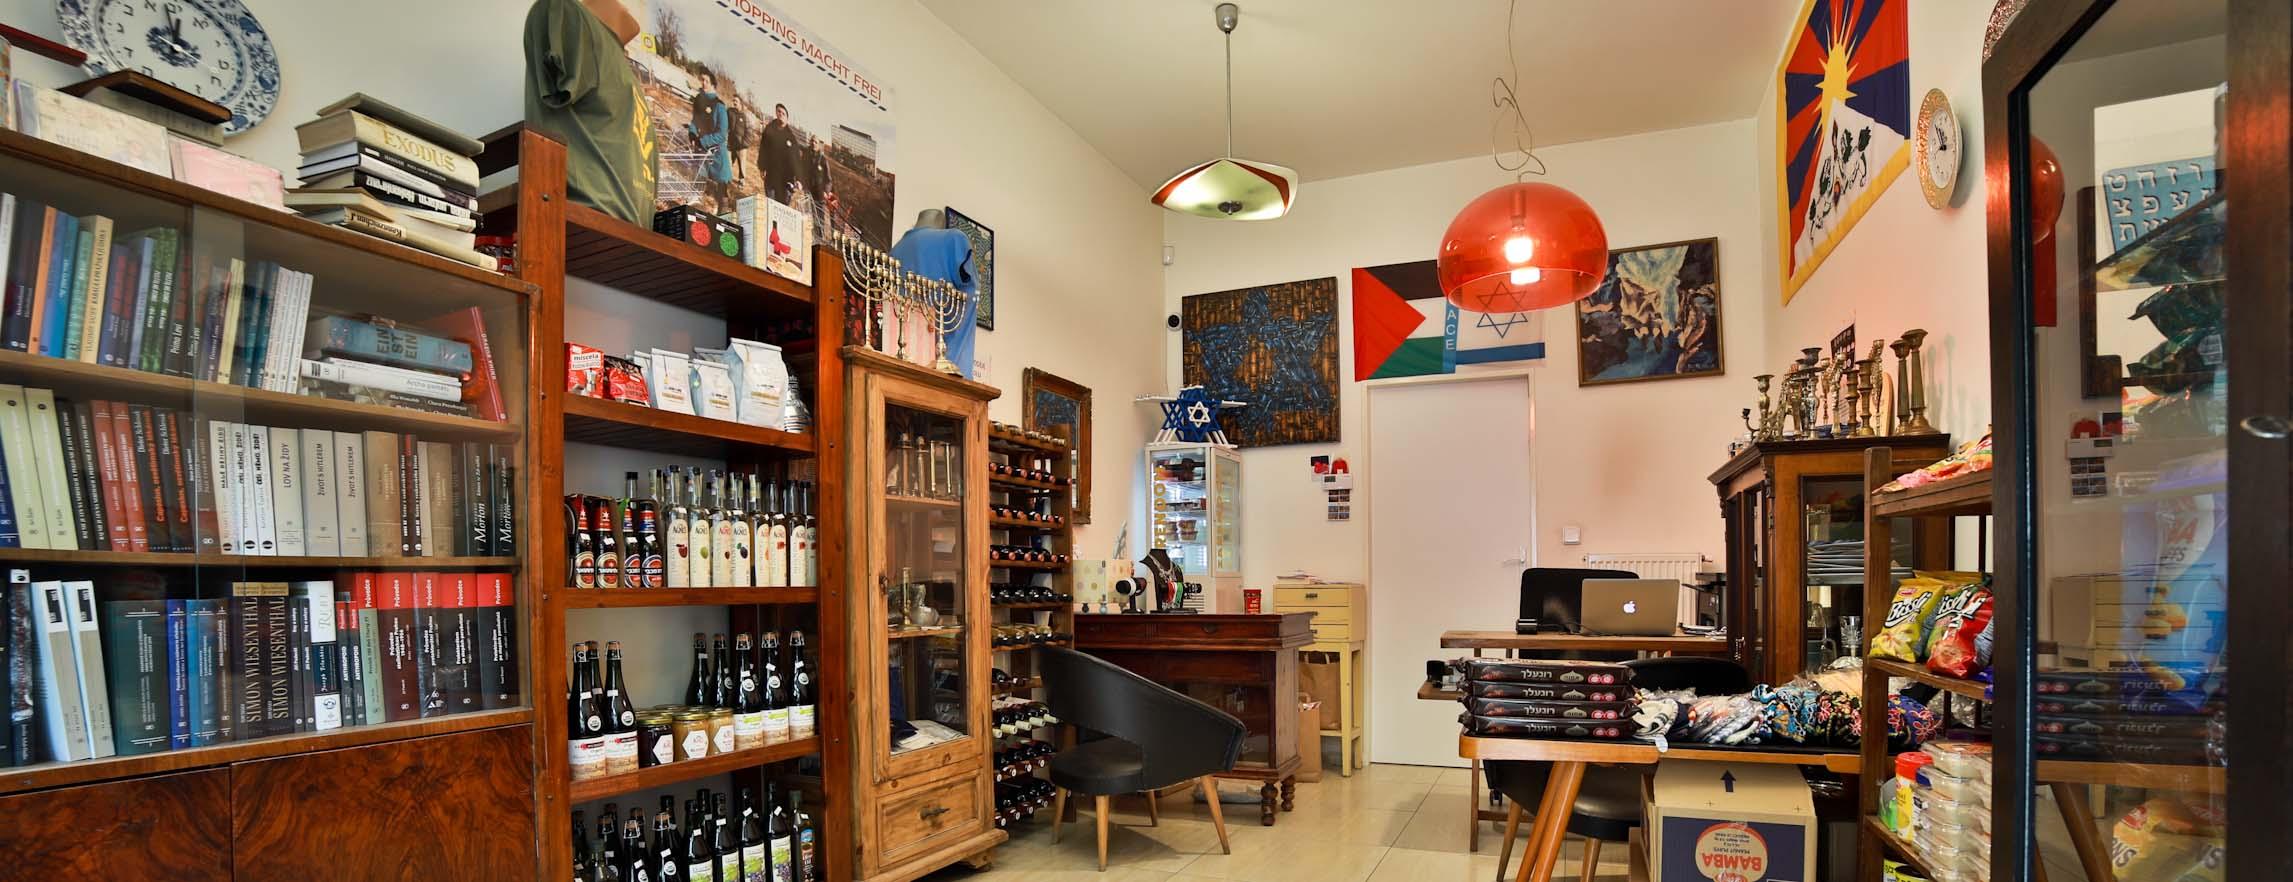 Judaica Store - jediný #JEWISHOP